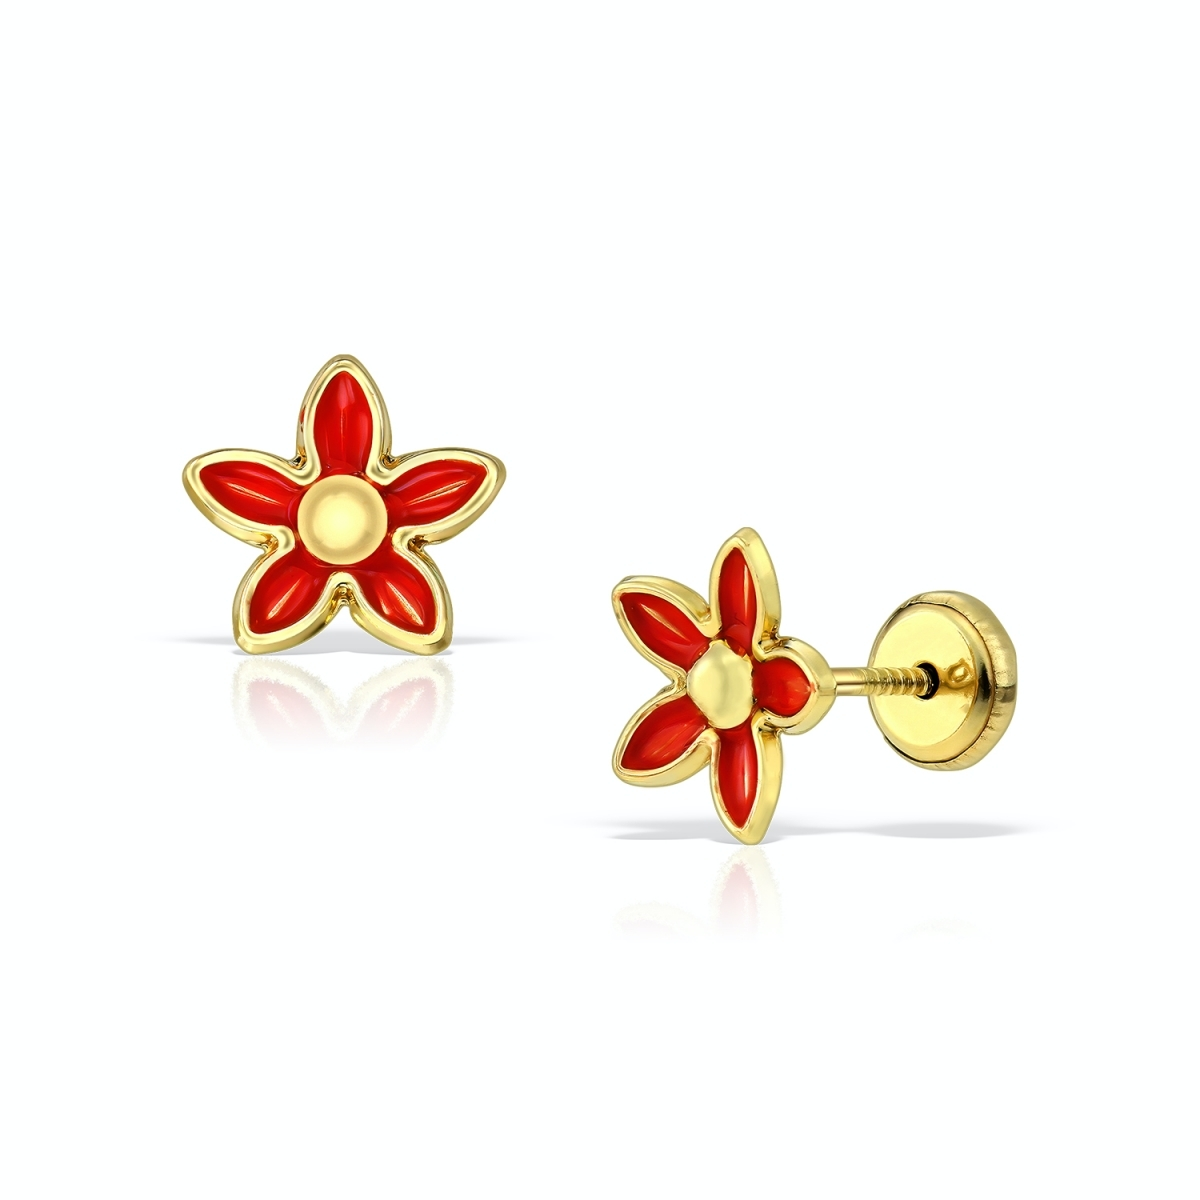 Cercei din aur, floare roșie cu email